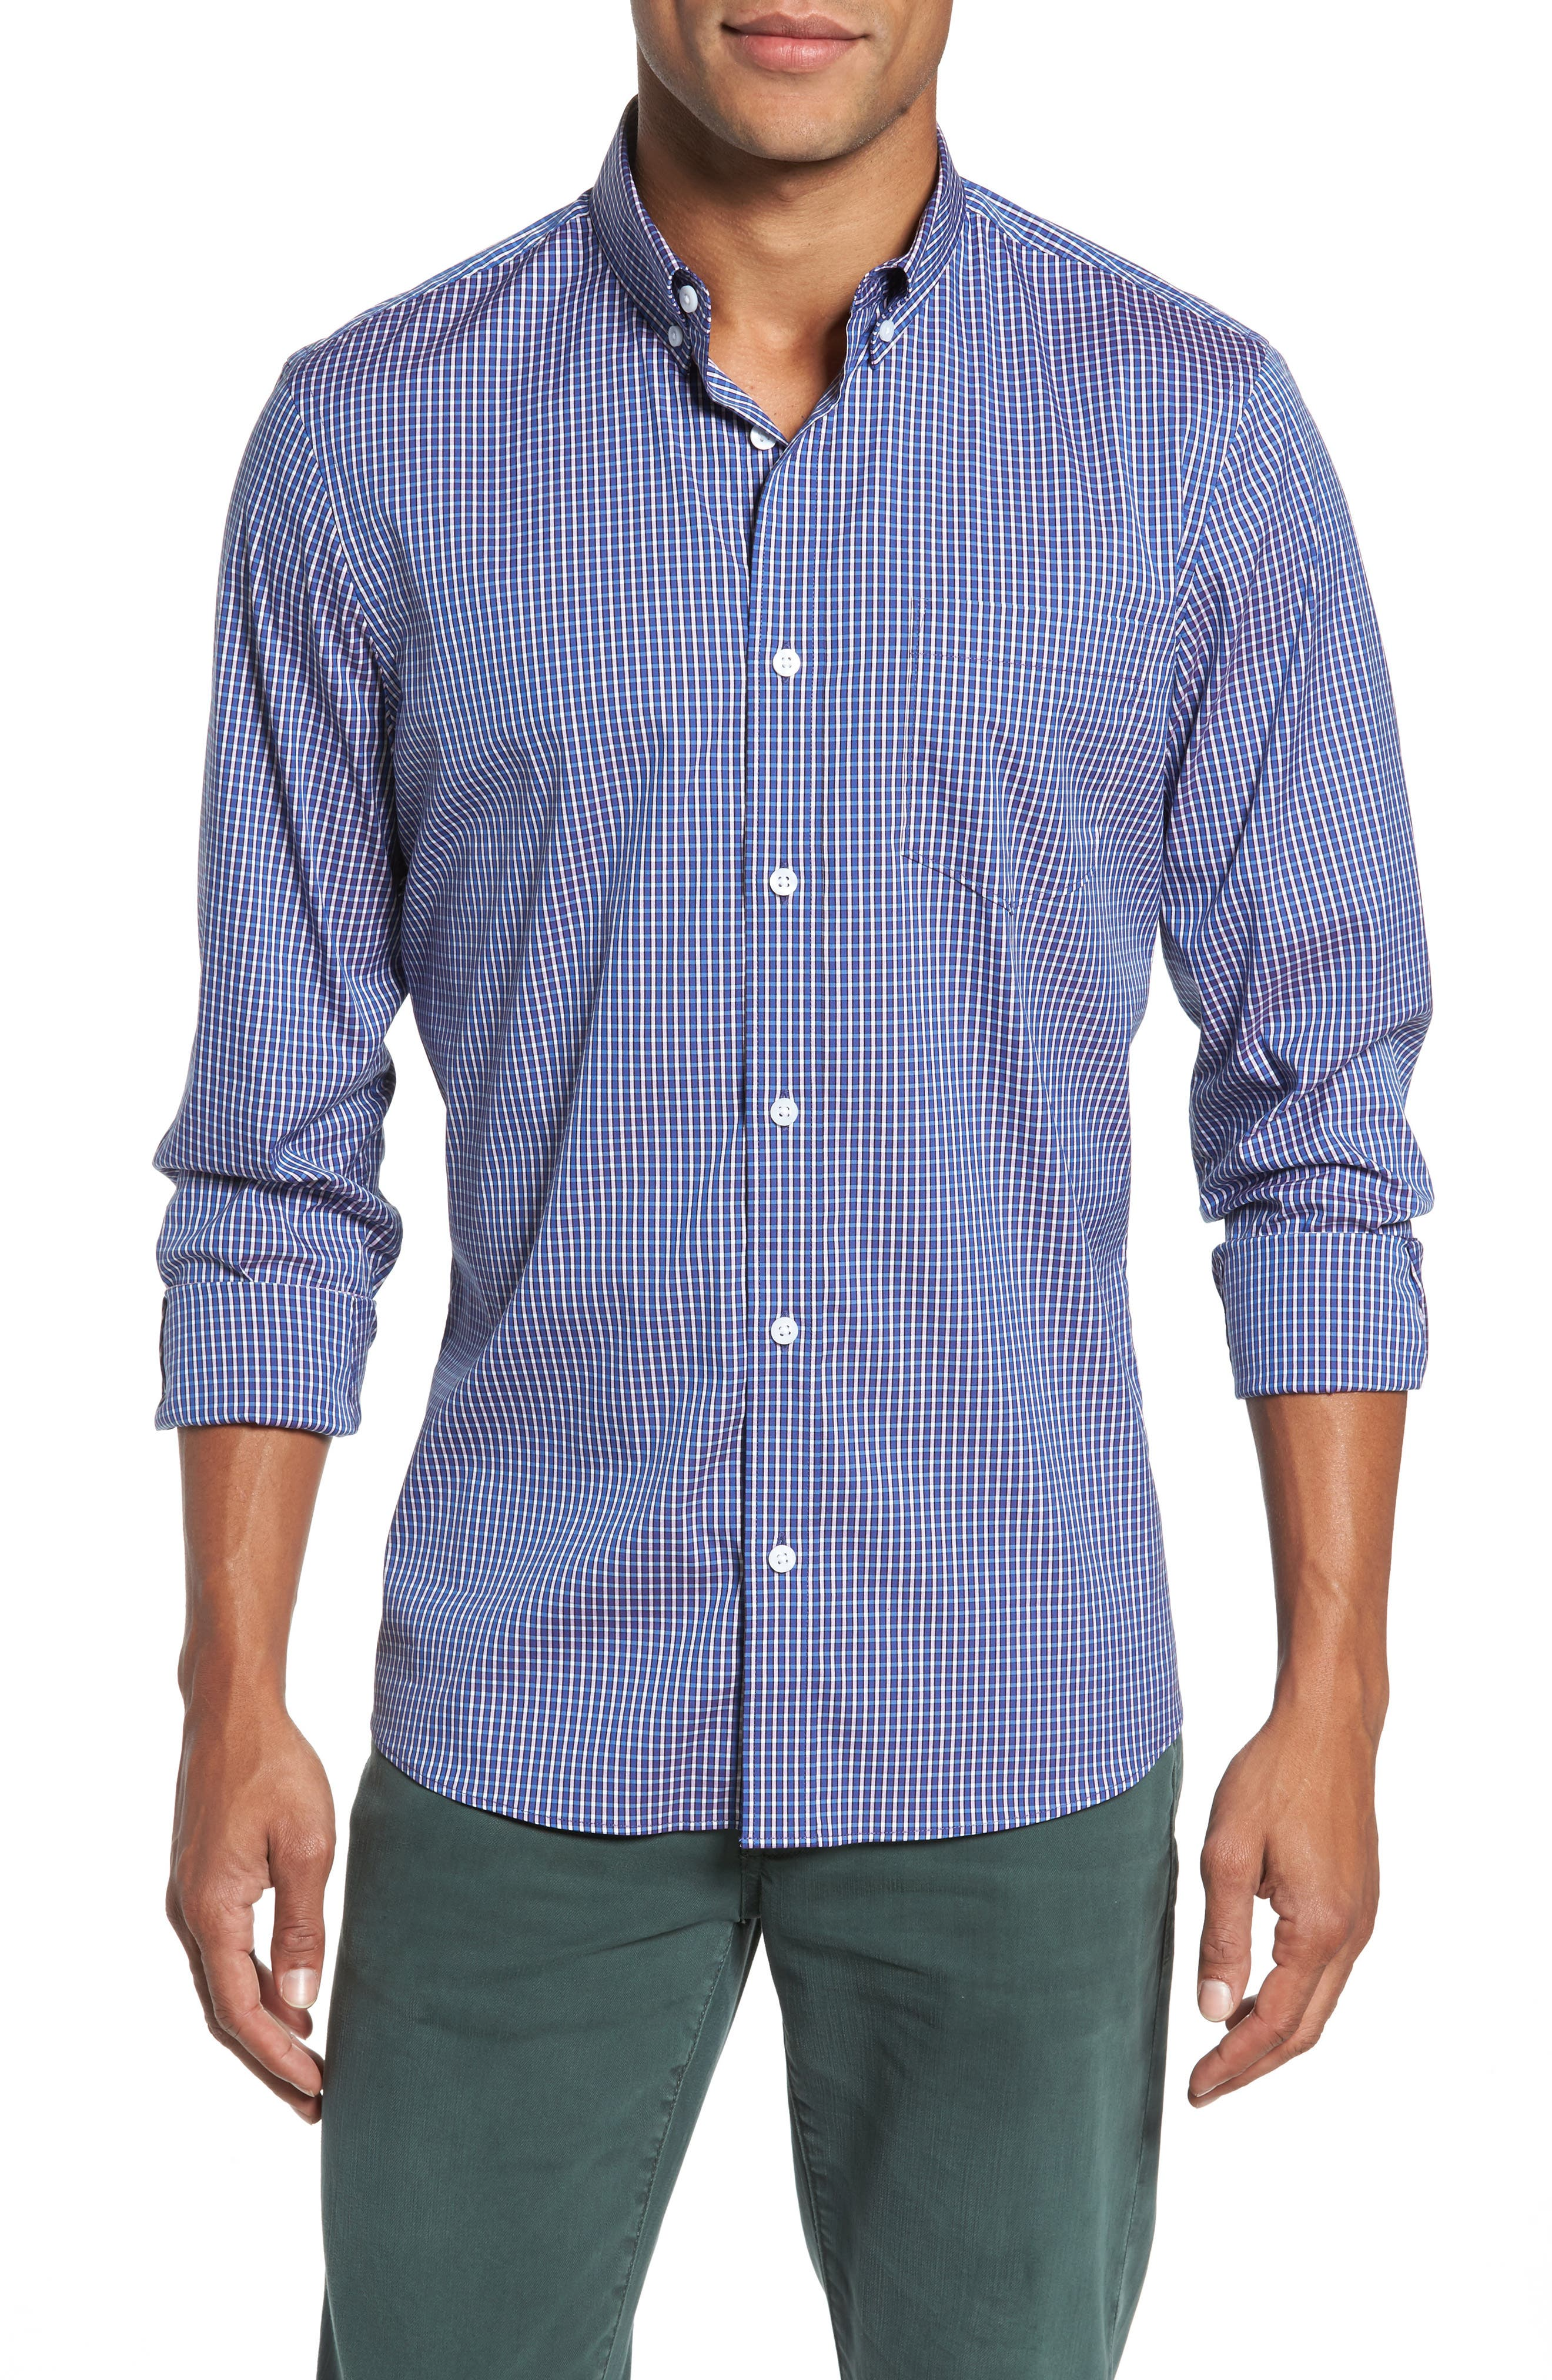 Alternate Image 1 Selected - Nordstrom Men's Shop Tech-Smart Trim Fit Check Sport Shirt